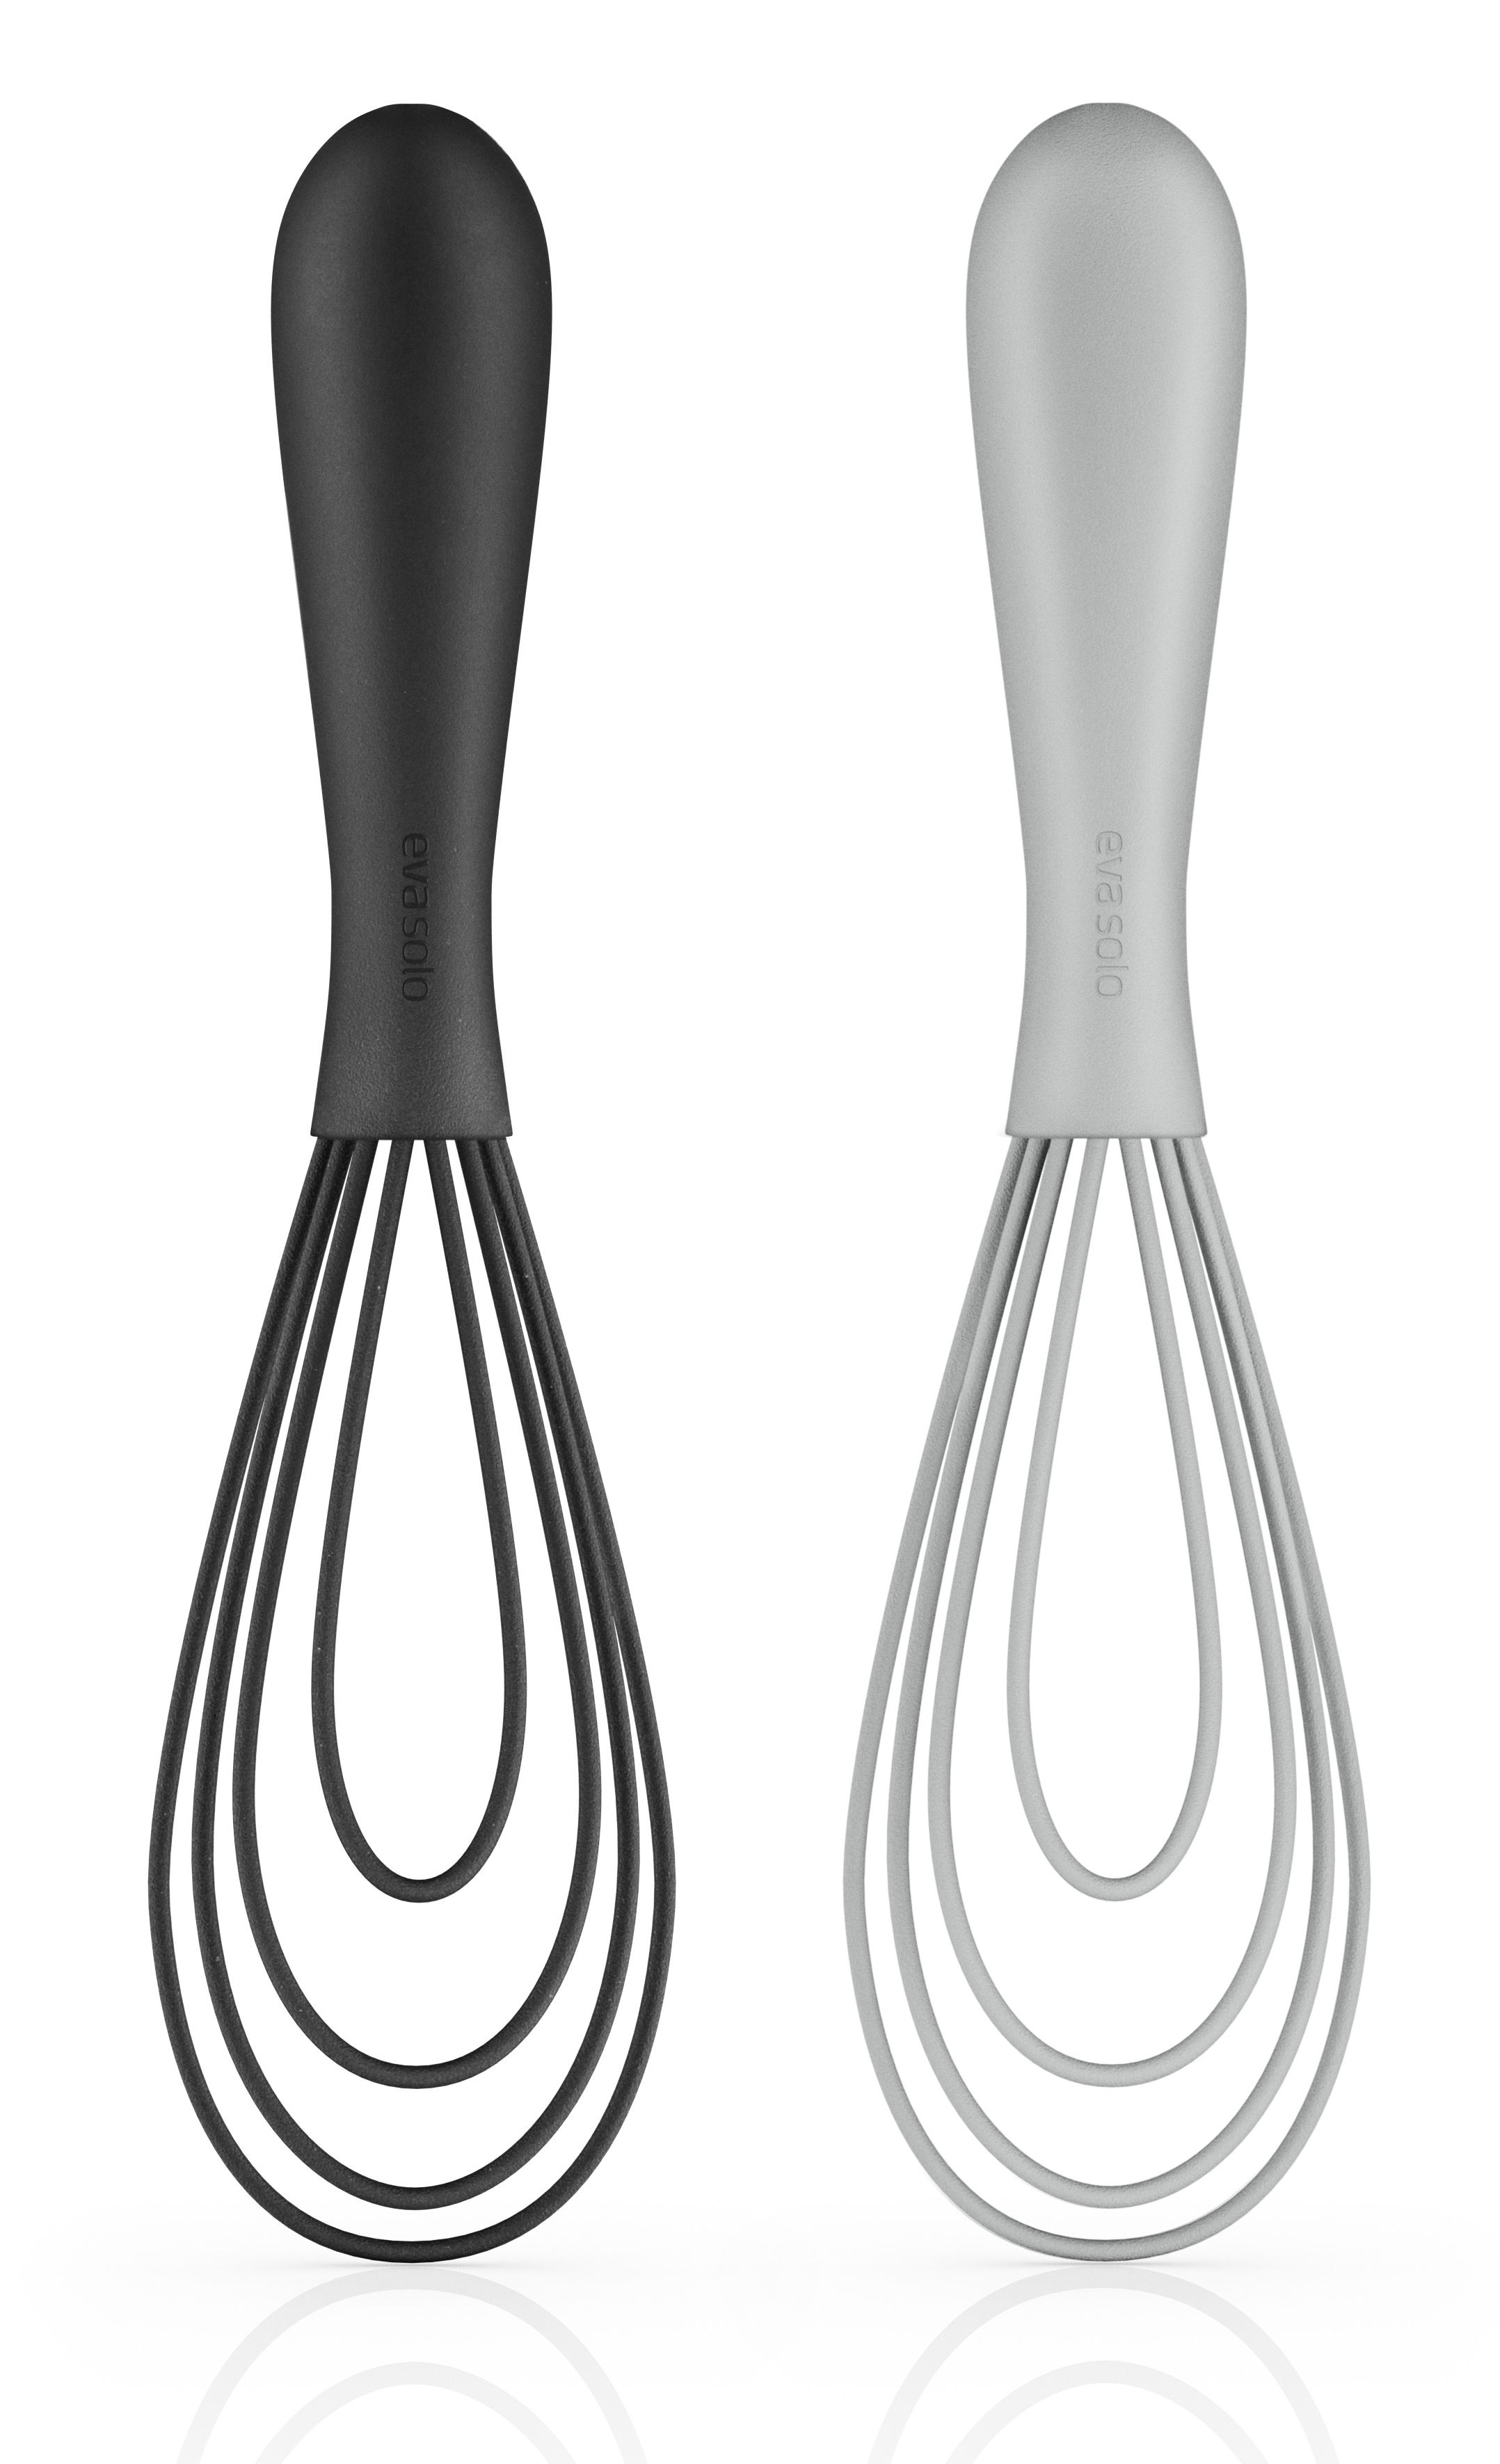 39 39 1 39 39 frusta da cucina 3 en 1 grigio nero by eva solo made in design - Frusta da cucina ...